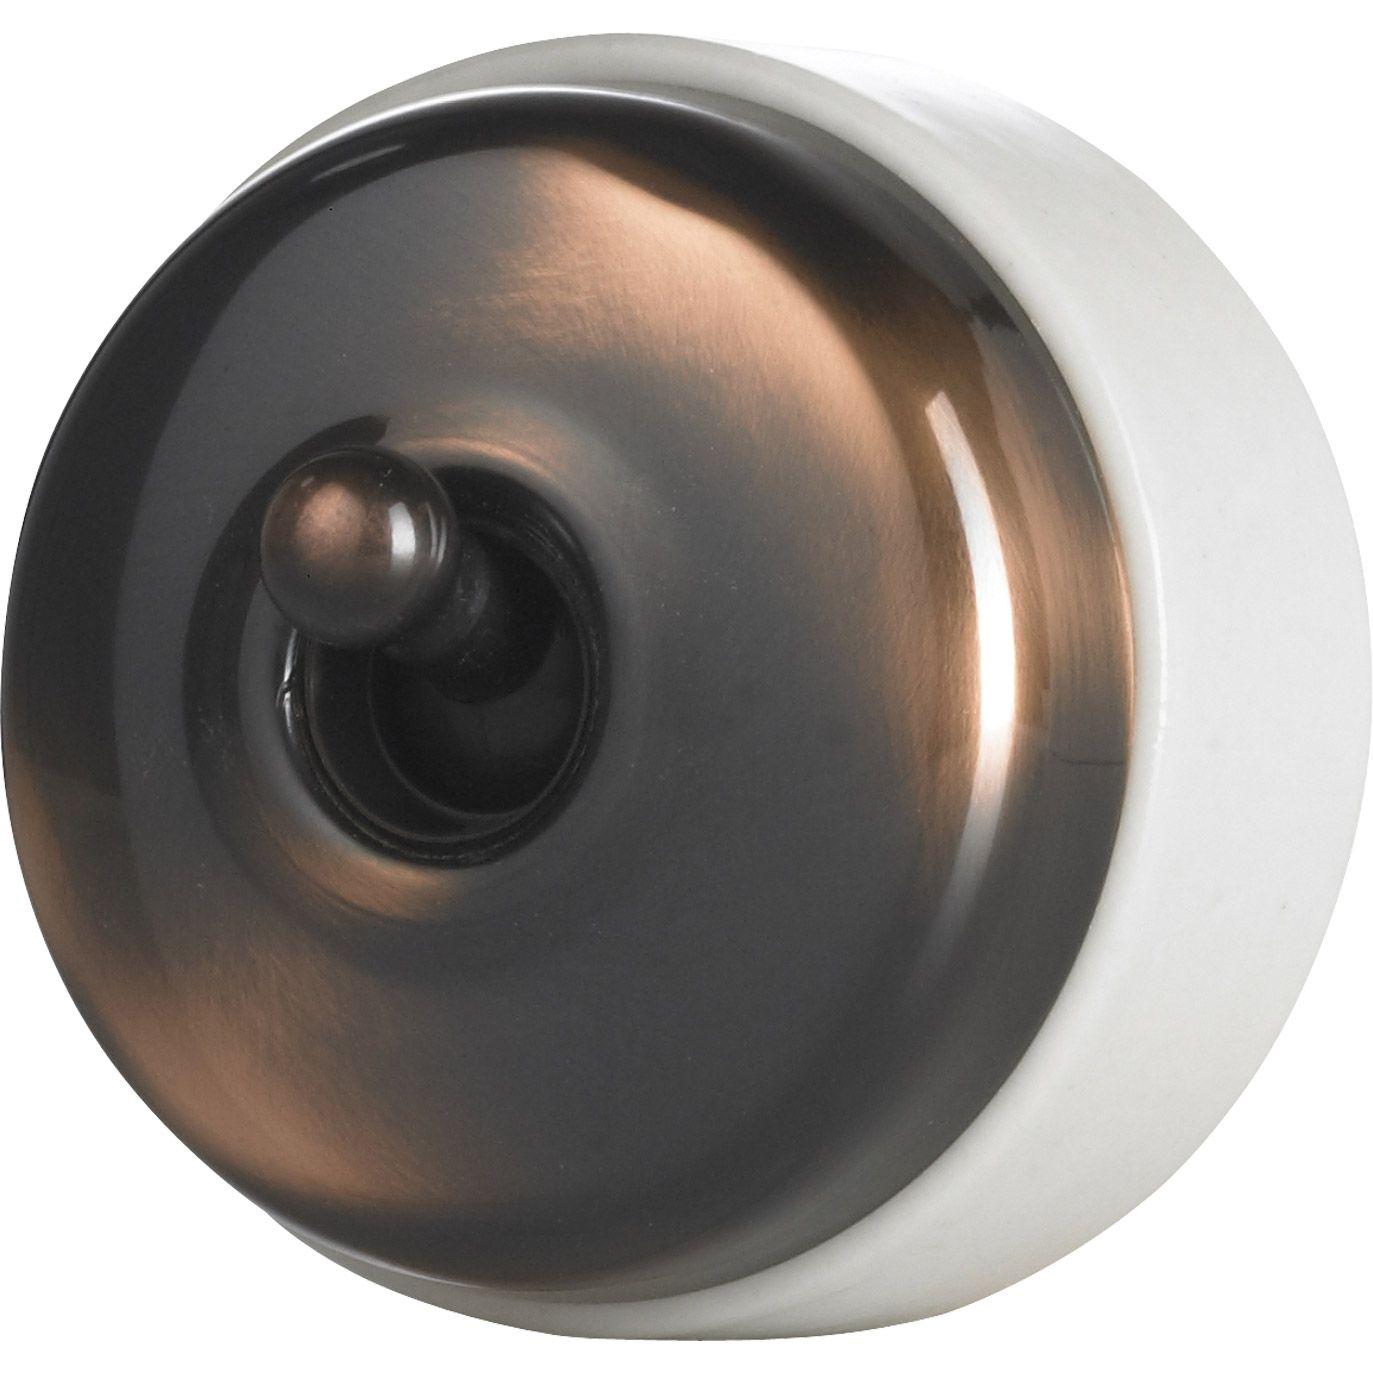 interrupteur va et vient en saillie cuivre schneider electric h ritage pinteres. Black Bedroom Furniture Sets. Home Design Ideas